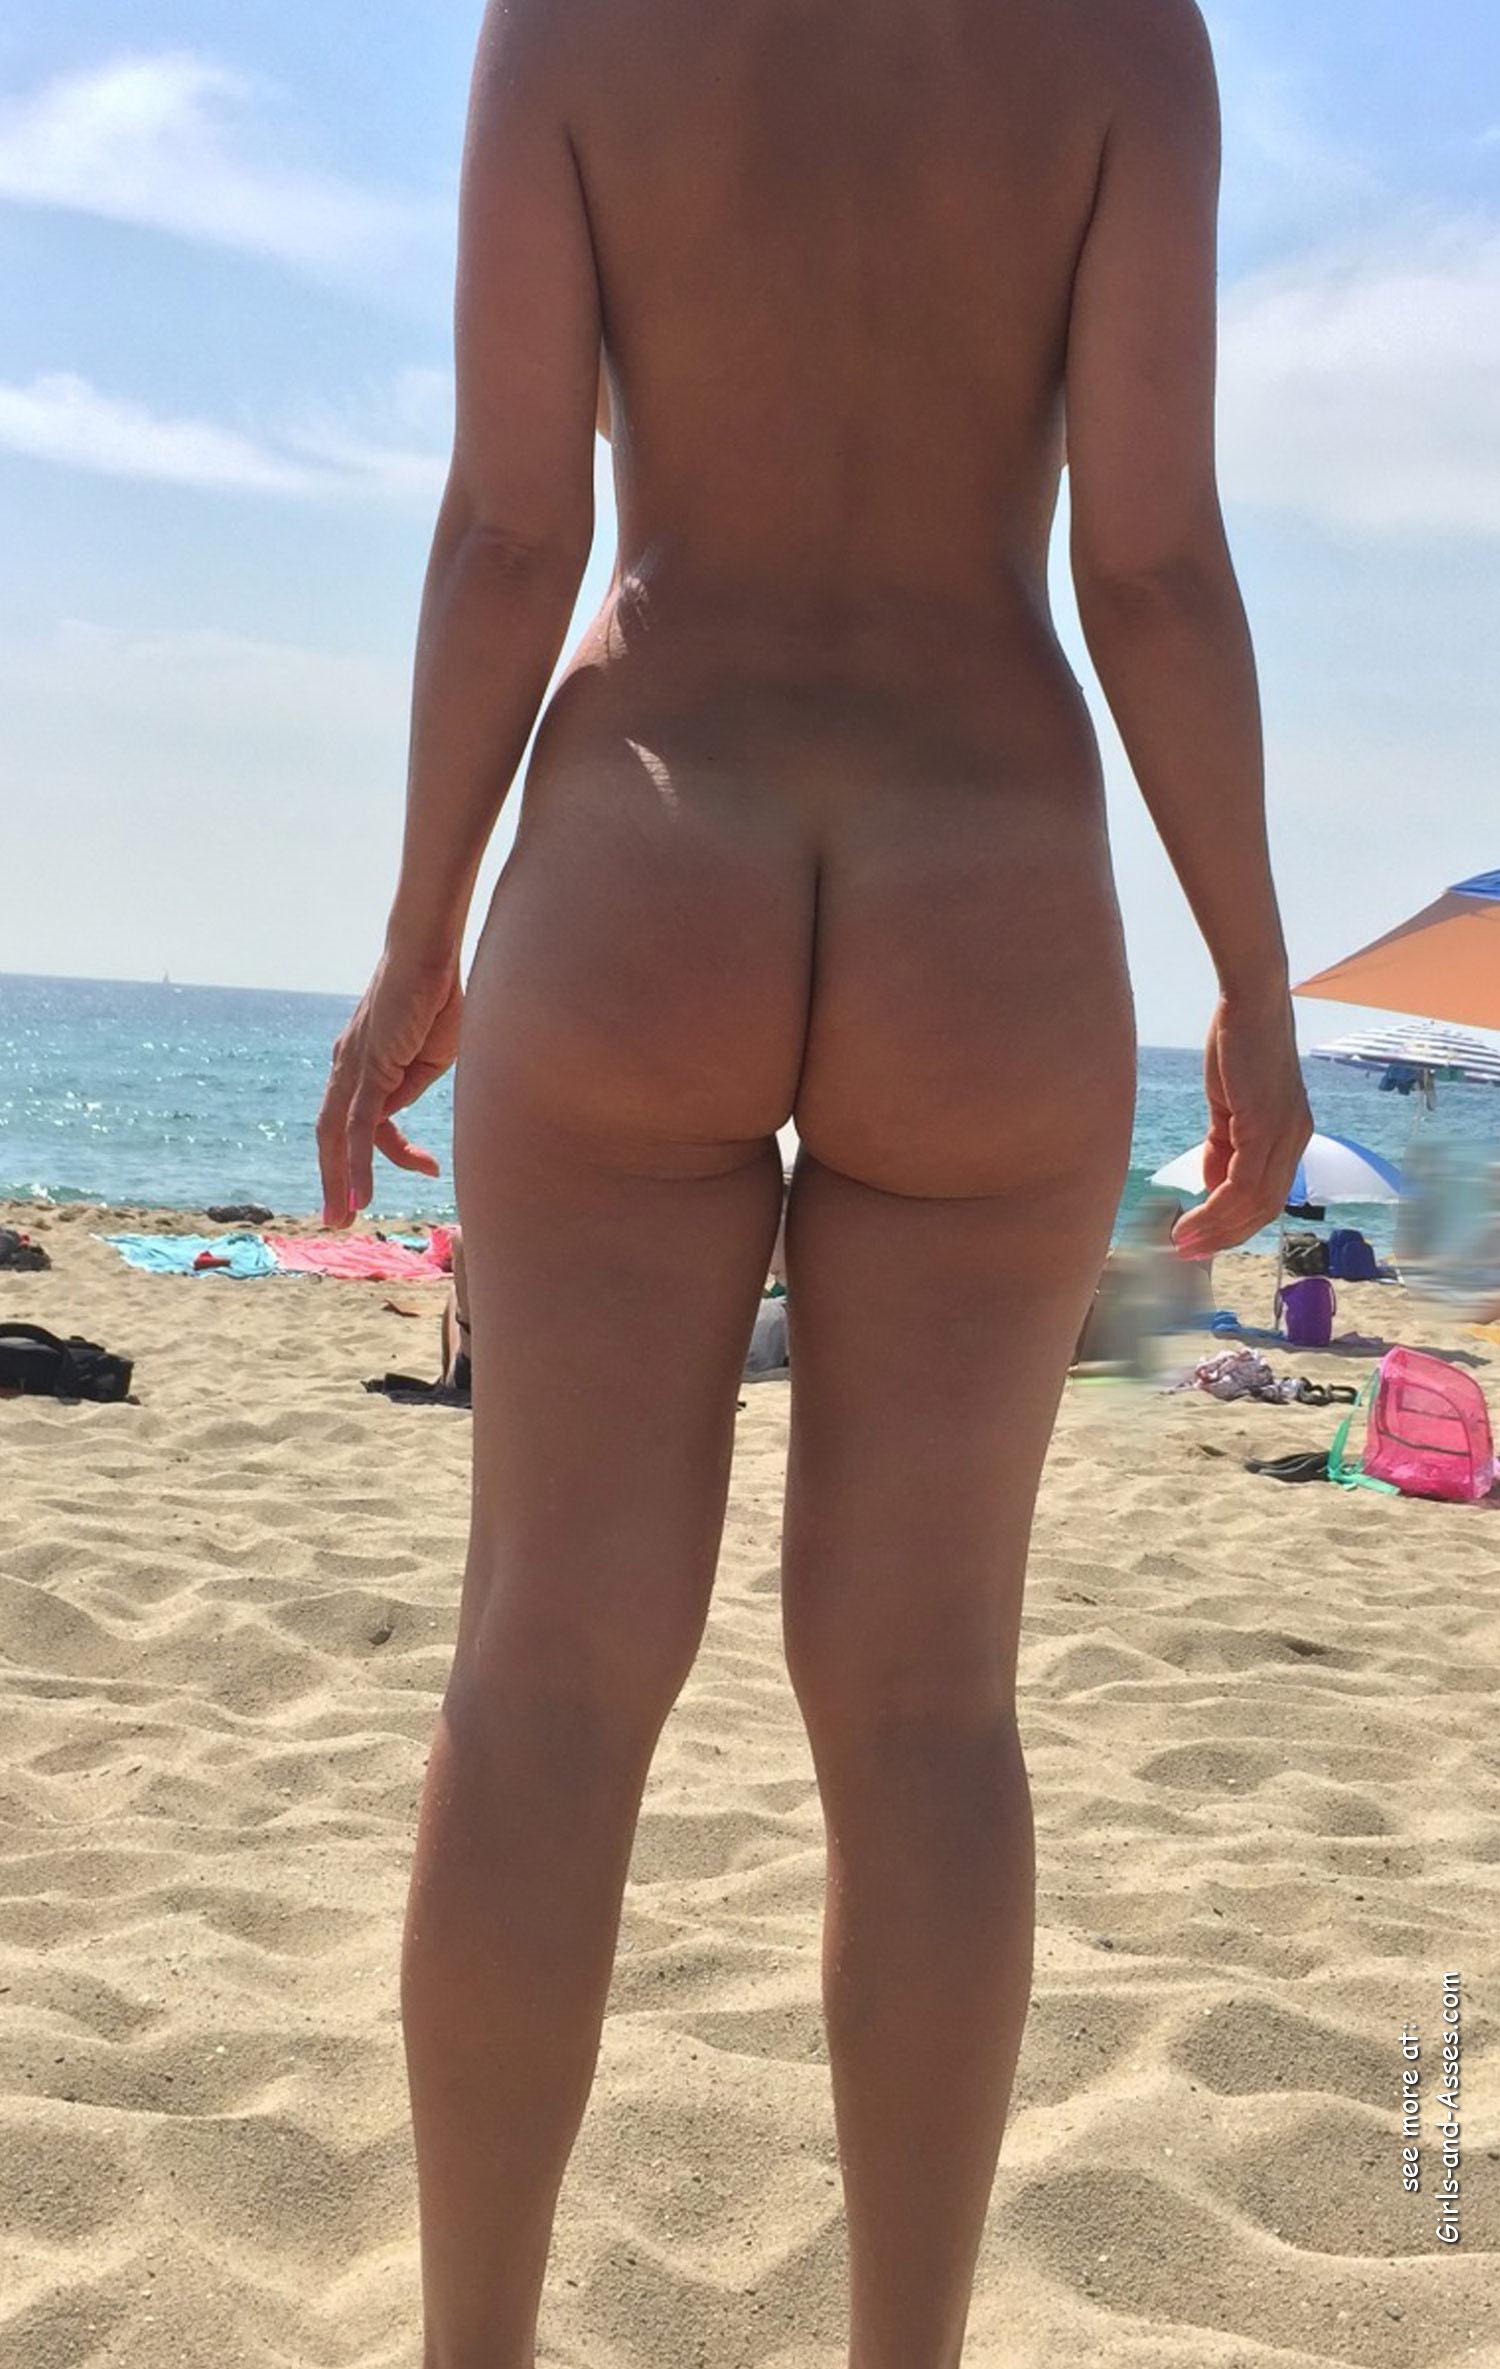 amatuer nude girl at the beach photography 04419